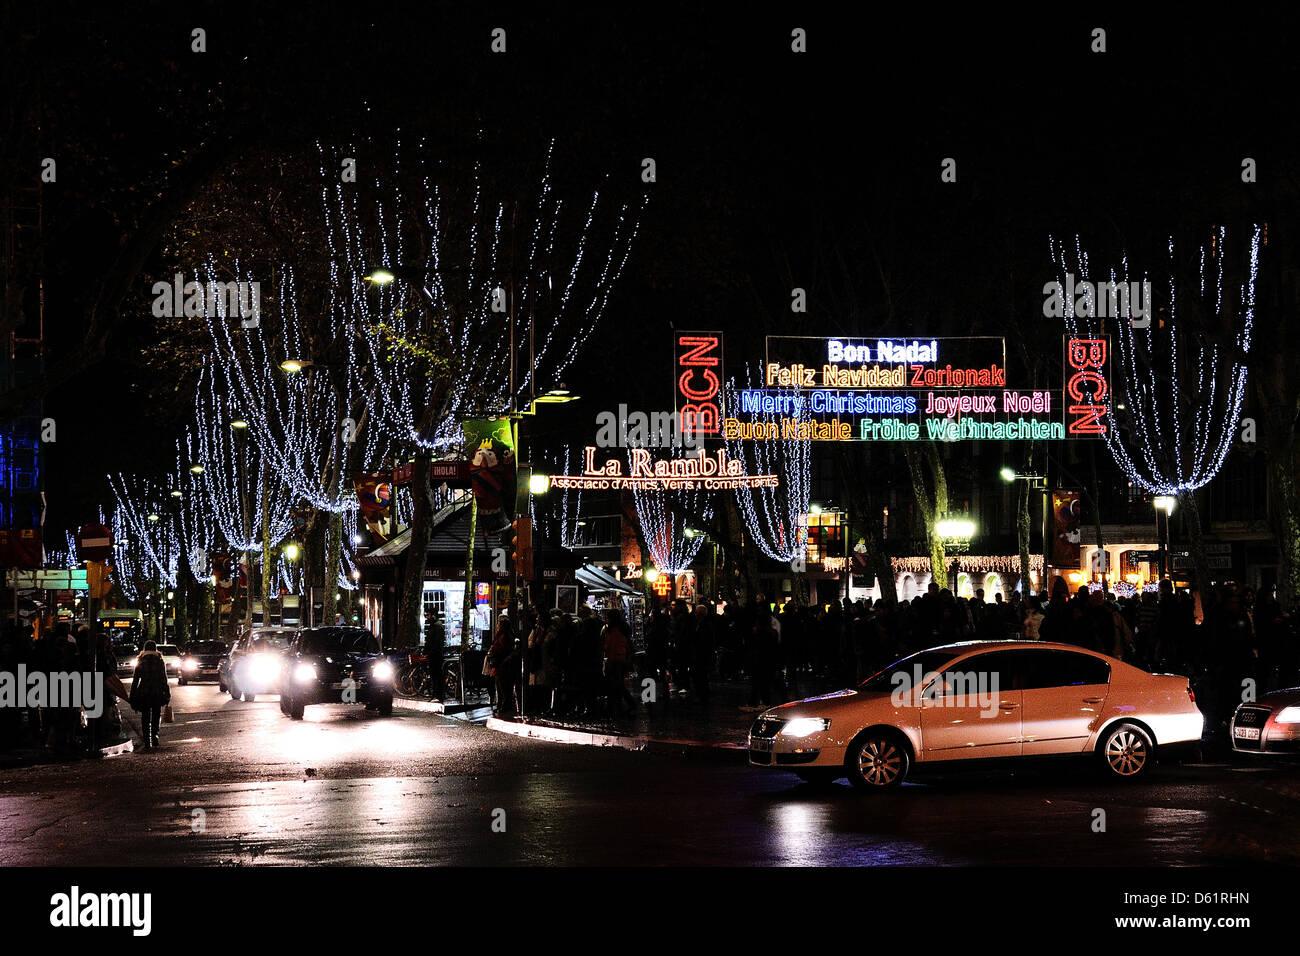 Buon Natale Meaning In English.Barcelona Spain Dec 23 Christmas Lights In Plaza De Catalunya